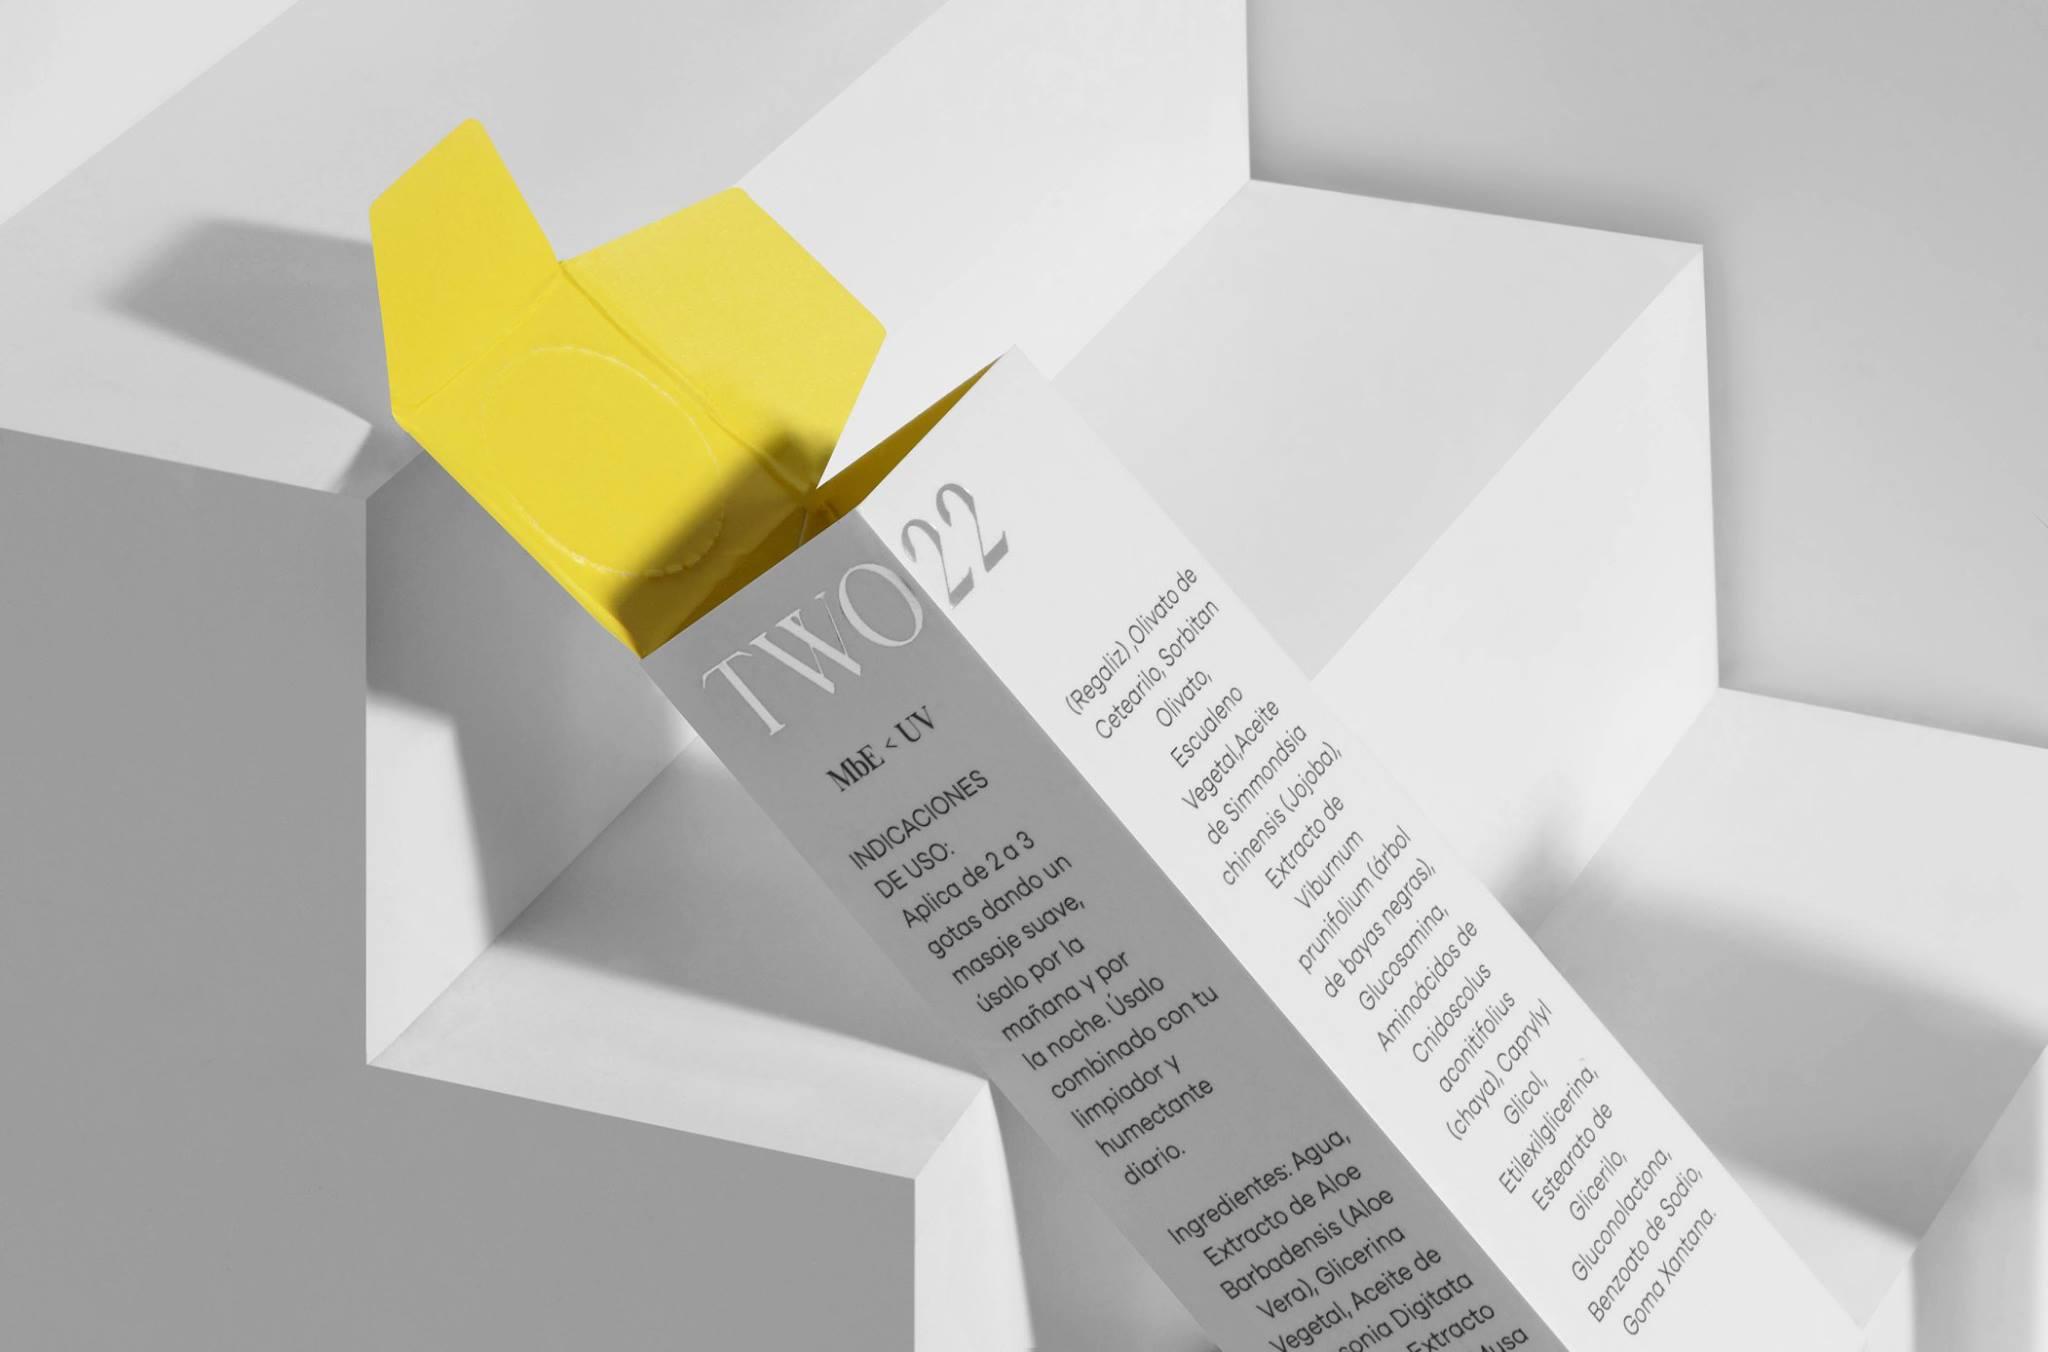 TWO22 by Futura - Creative Work - $i